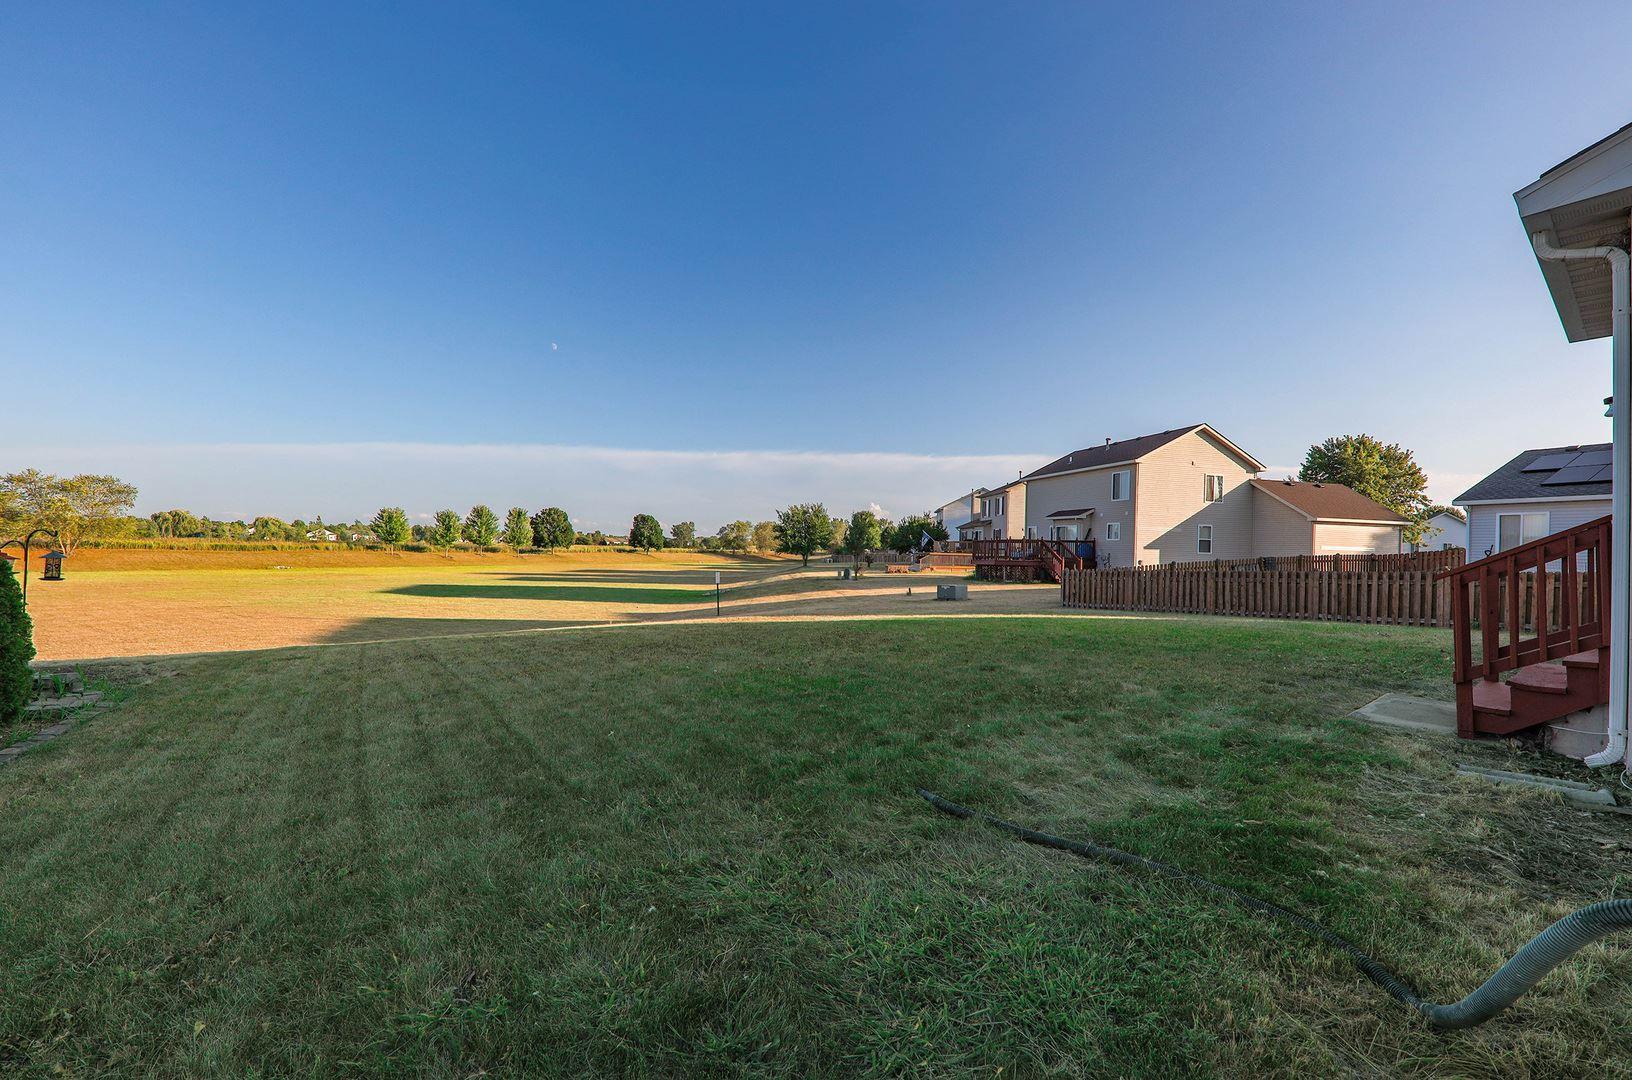 Photo of 1675 Richfield Trail, Romeoville, IL 60446 (MLS # 10851068)